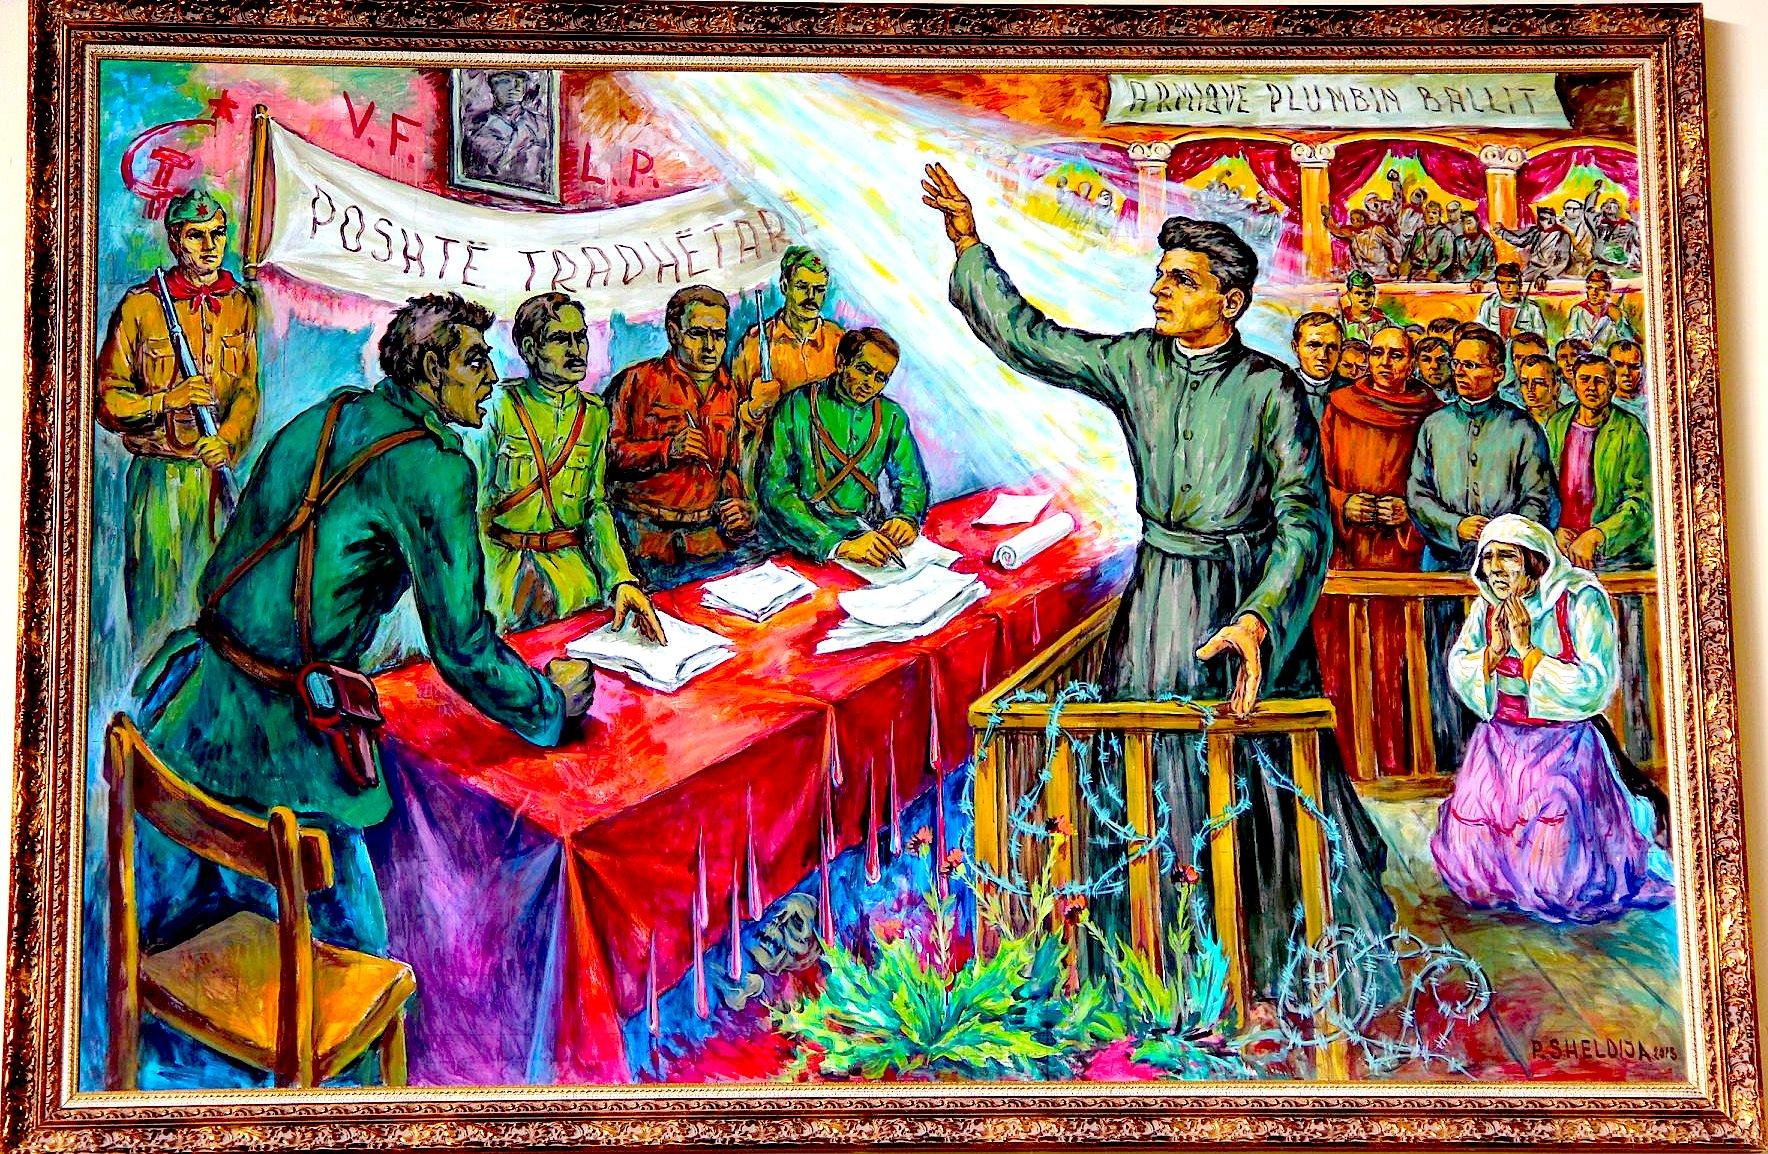 Pjerin Sheldija - Gjyqet komuniste kundra klerit